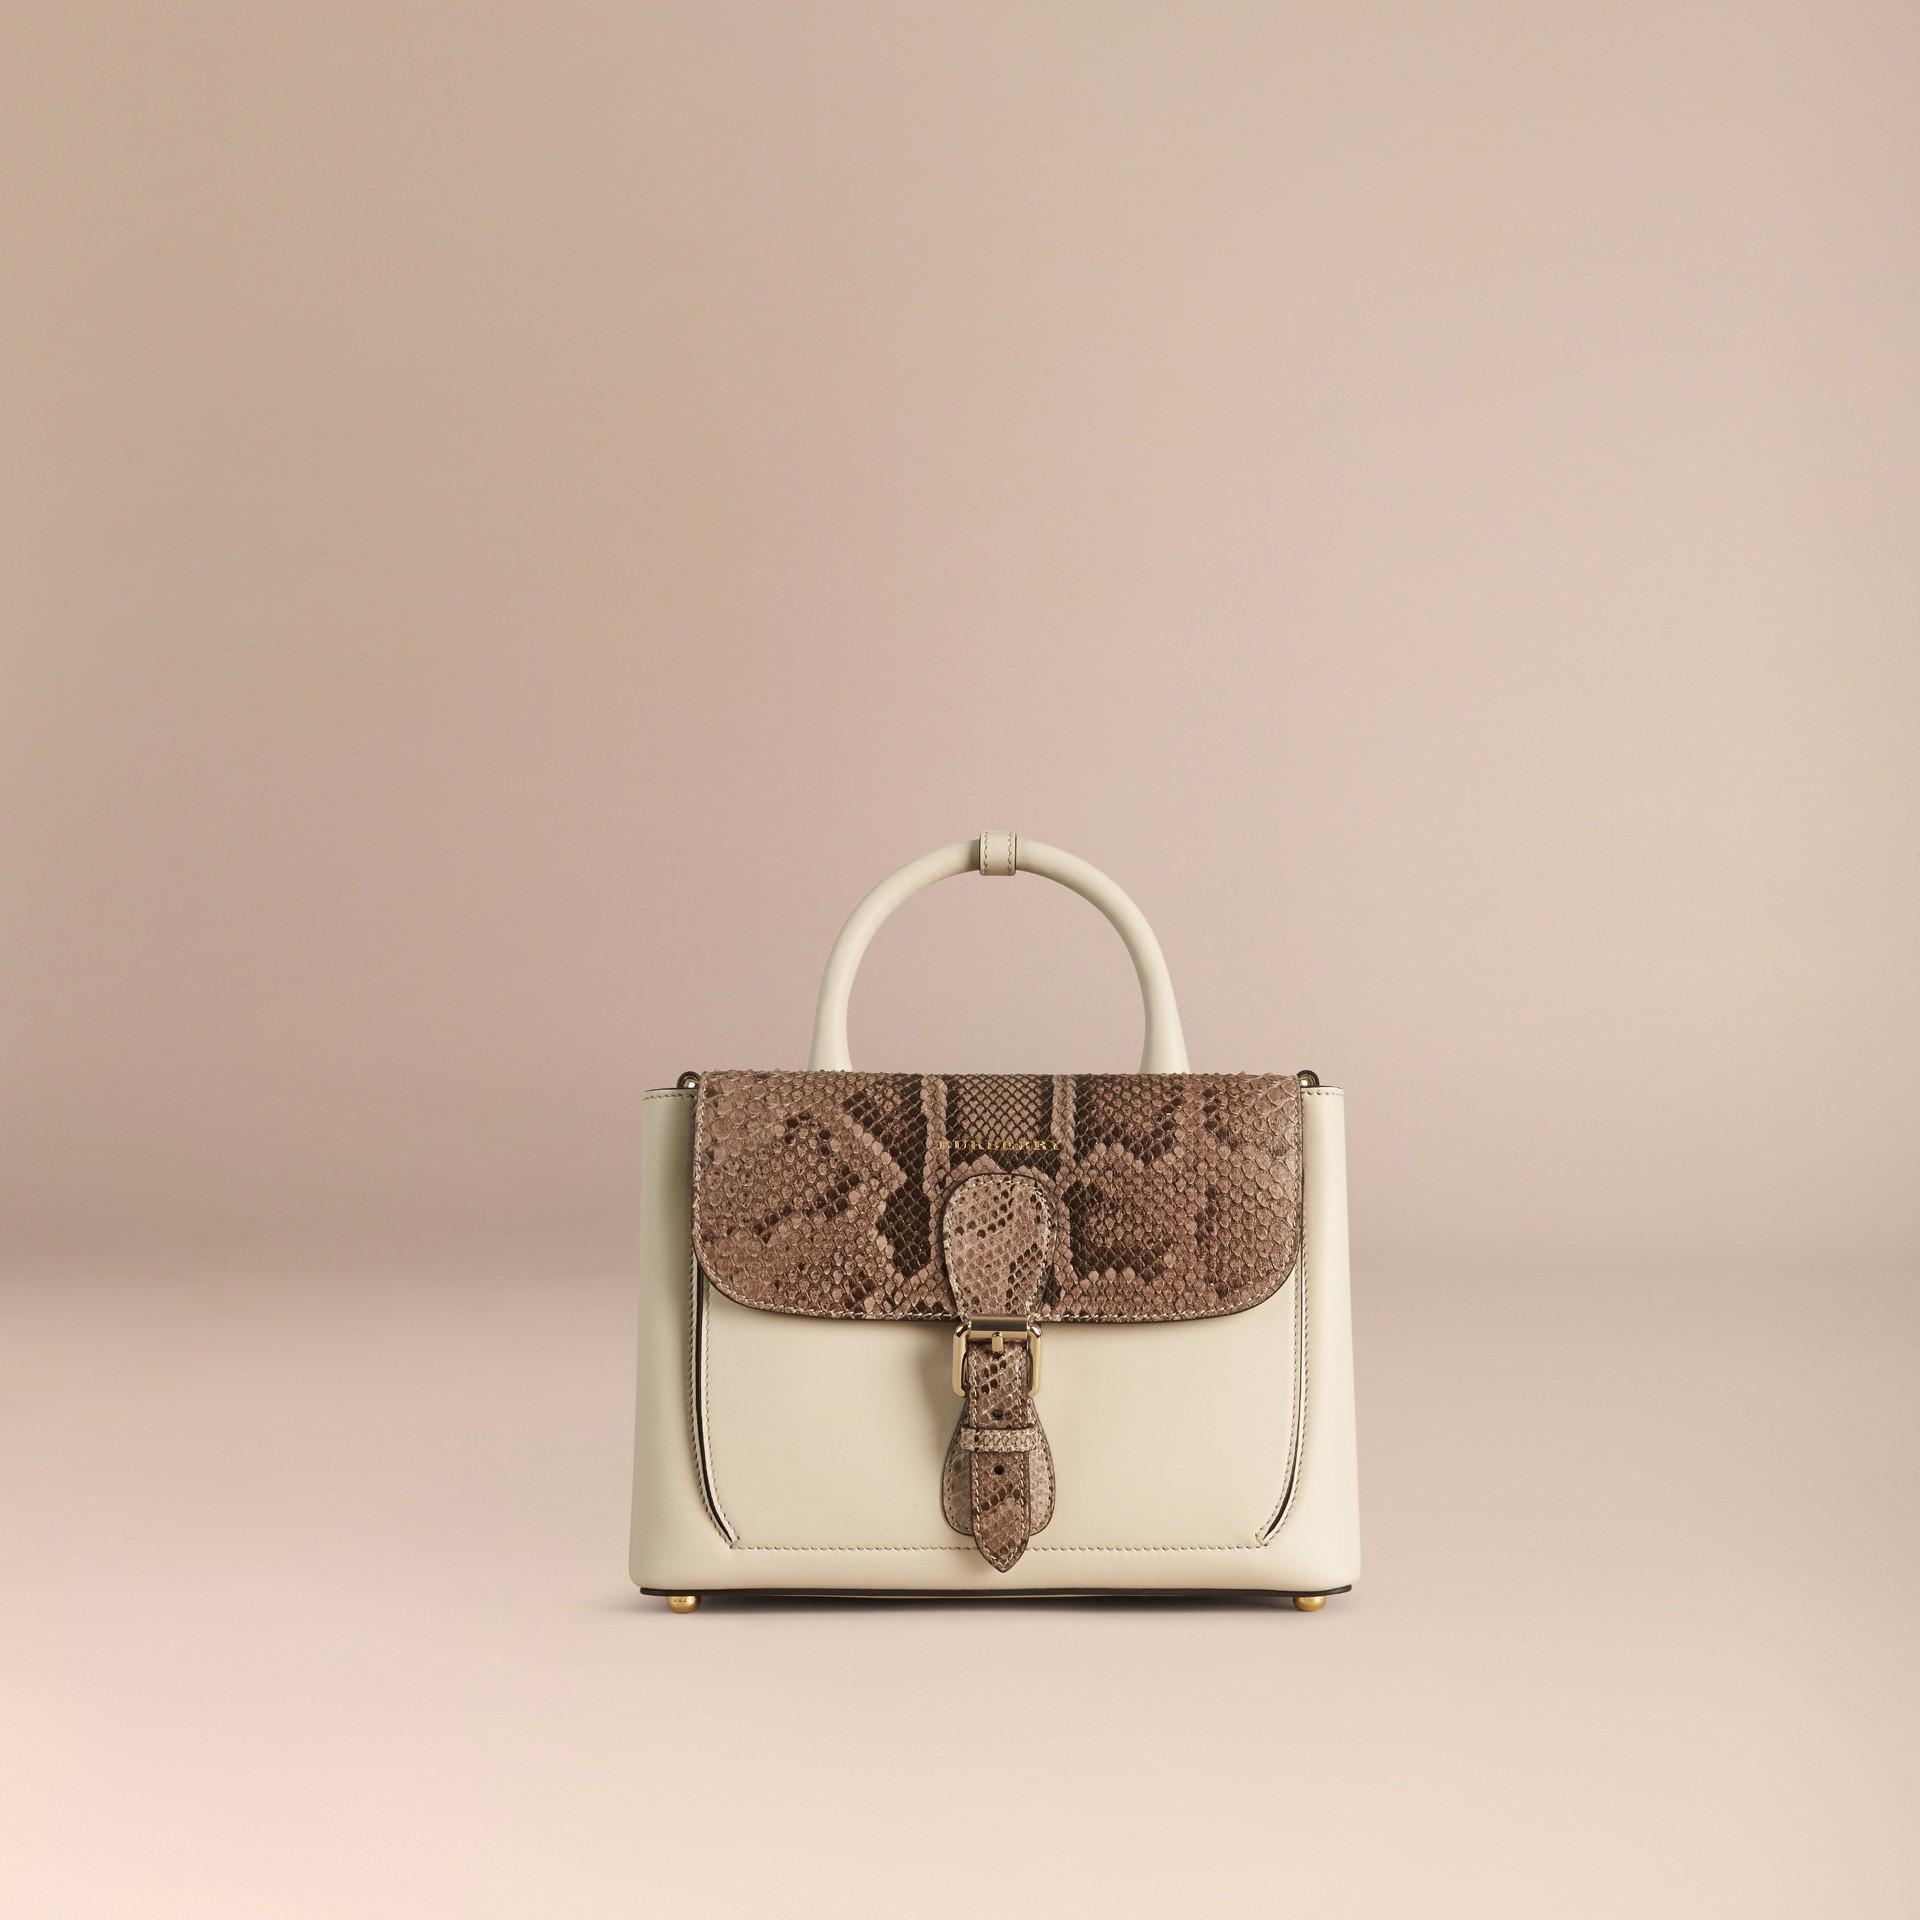 Steinfarben The Small Saddle Bag aus Glattleder und Pythonleder - Galerie-Bild 7